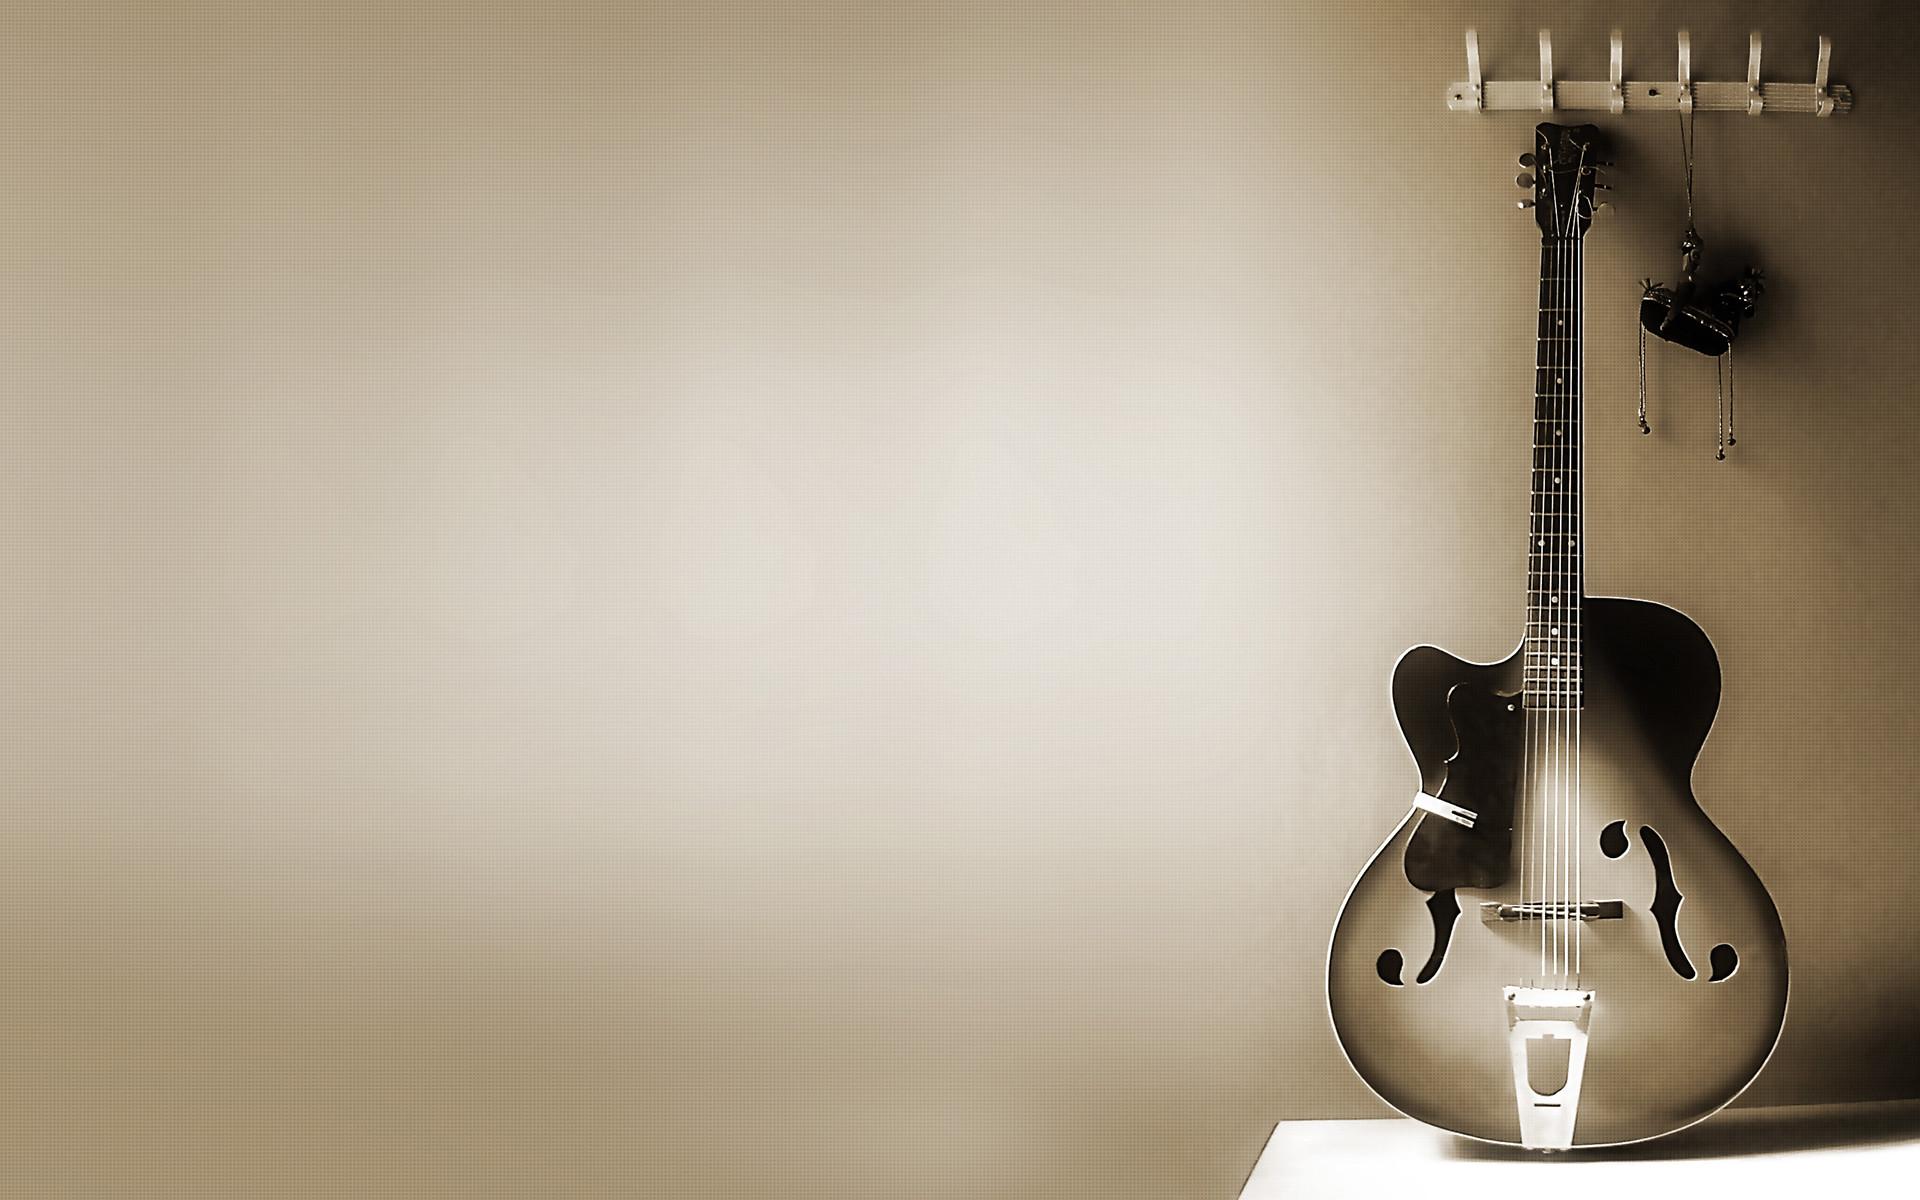 1920x1080 Taylor 814 CE Grand Auditorium Cutaway ES2 Acoustic Guitar Demo